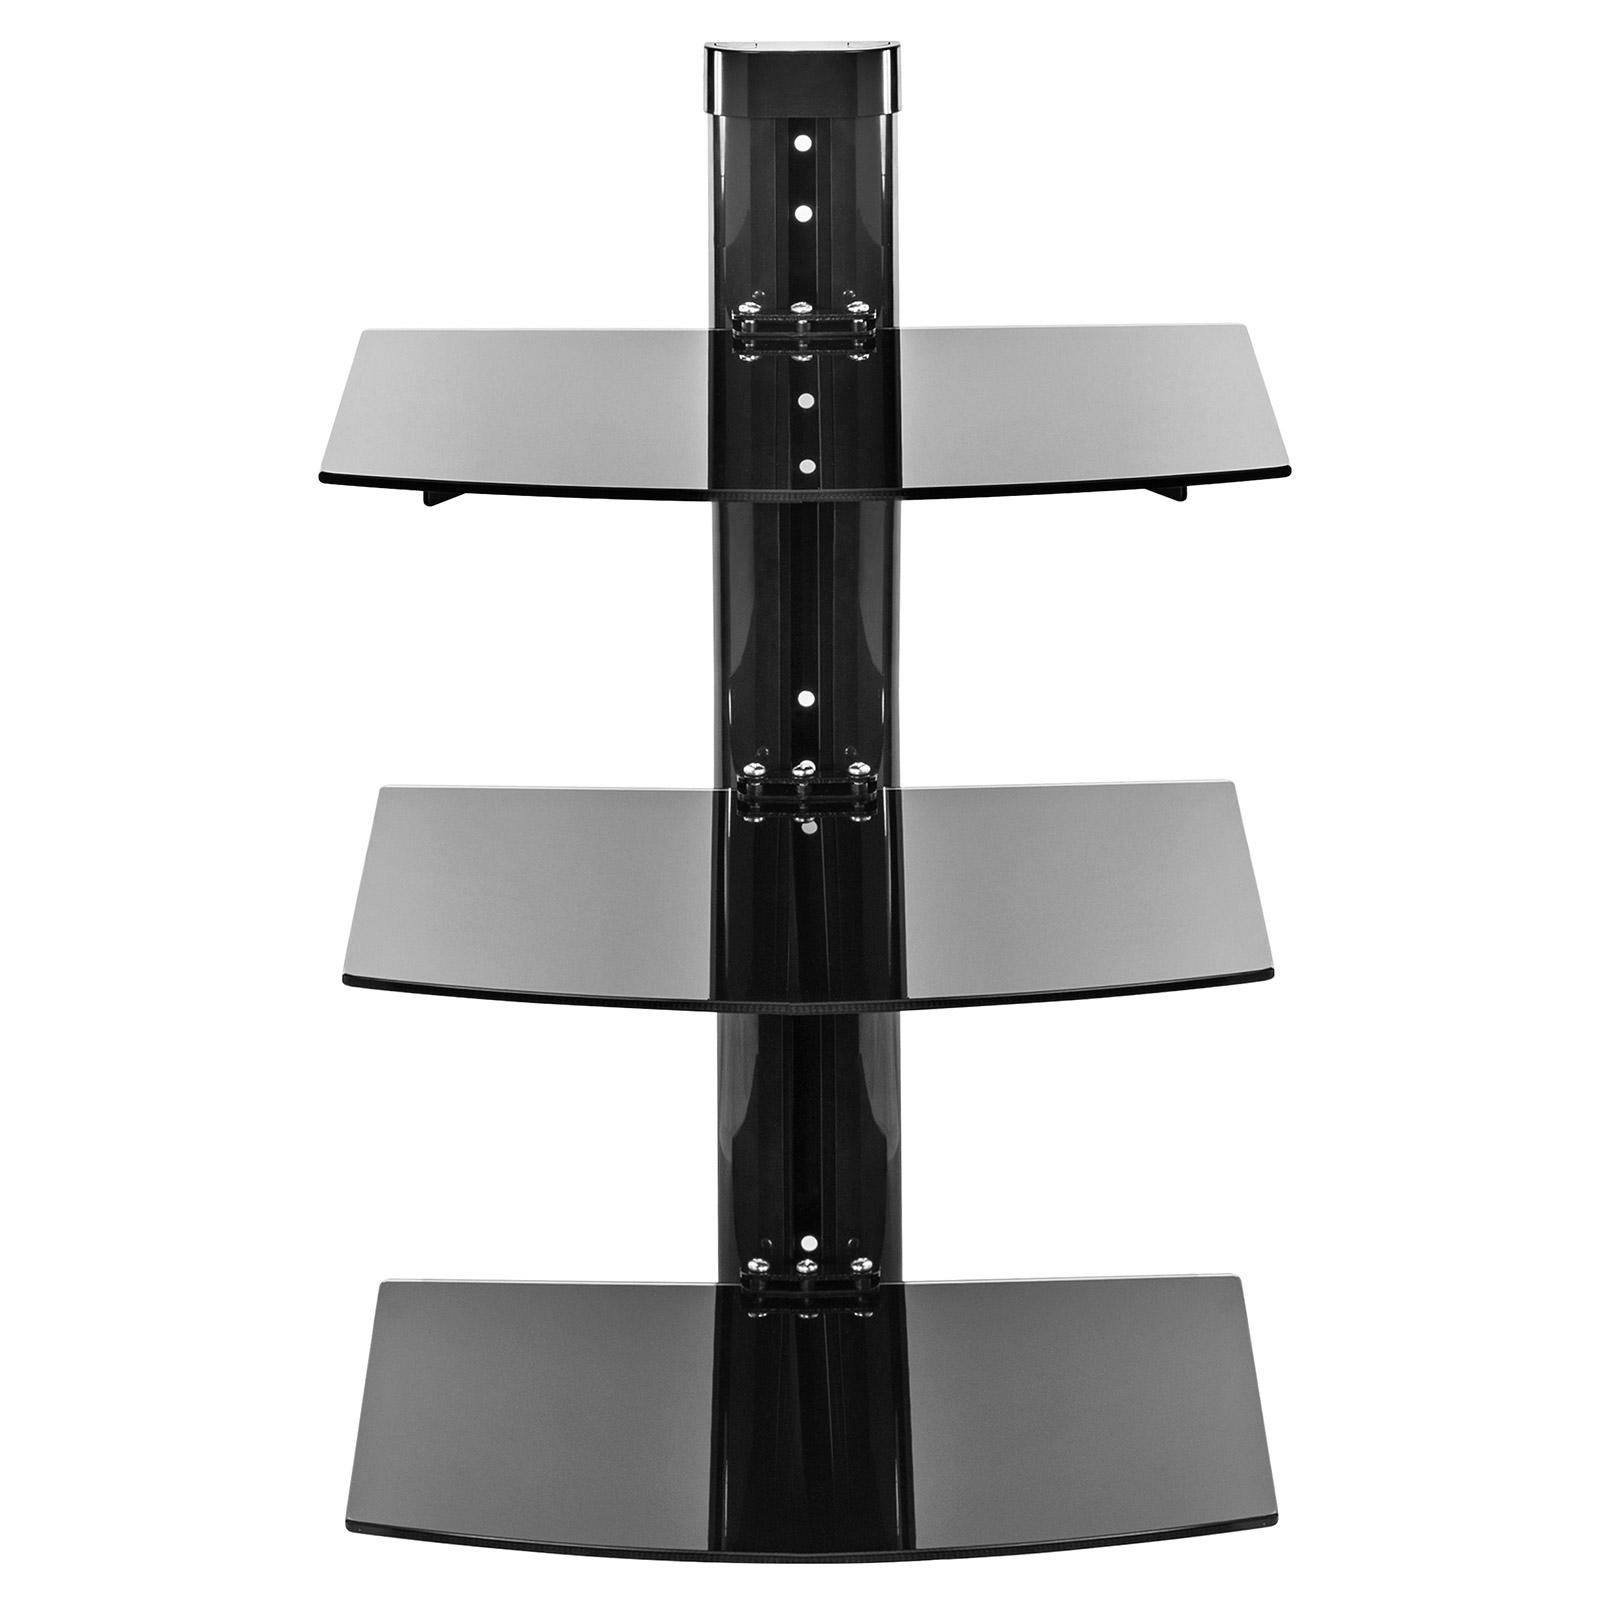 3 shelf floating wall mount dvd tv component av console. Black Bedroom Furniture Sets. Home Design Ideas